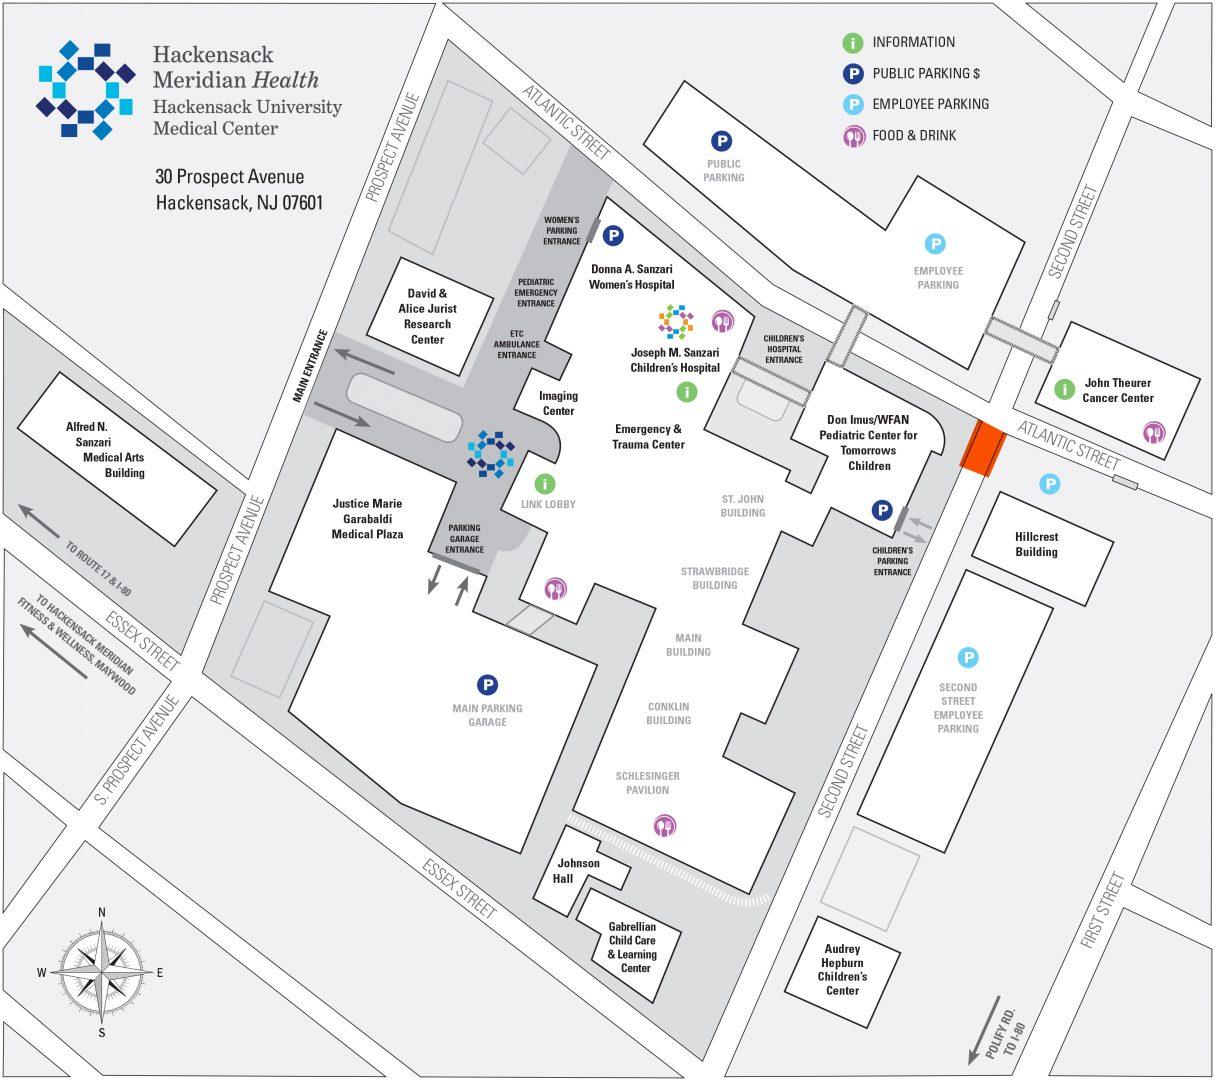 Hackensack University Medical Center Campus Map